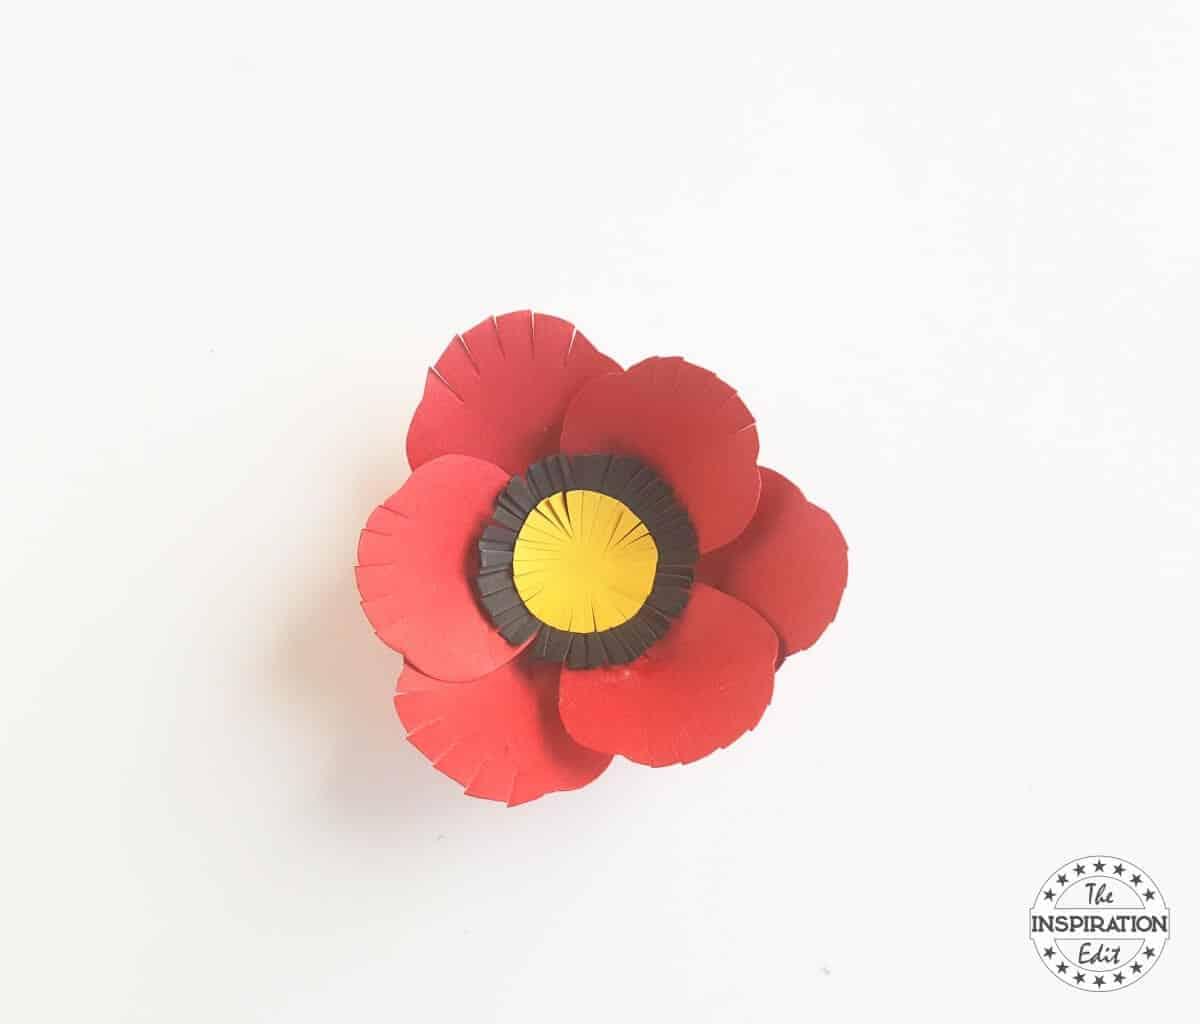 Poppy flower with poppy craft template the inspiration edit making a poppy flower using a poppy craft template mightylinksfo